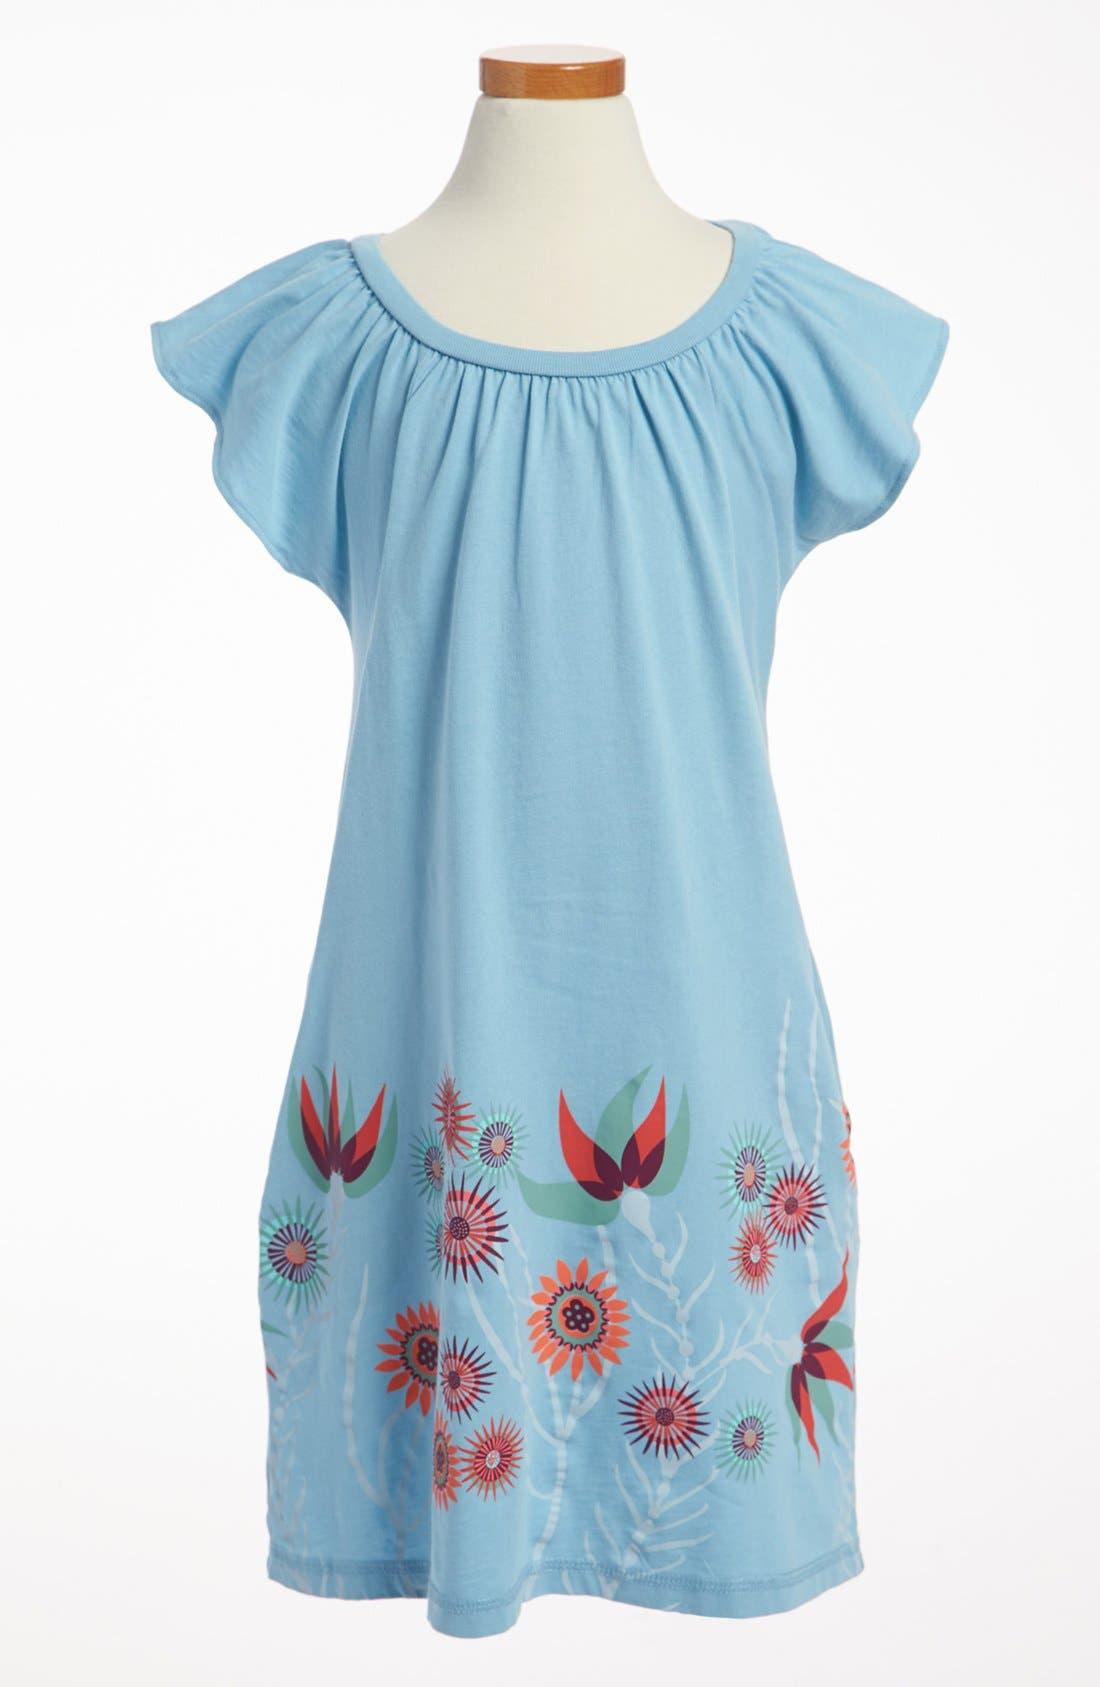 Alternate Image 1 Selected - Tea Collection 'Anemone Garden' Minidress (Little Girls & Big Girls)